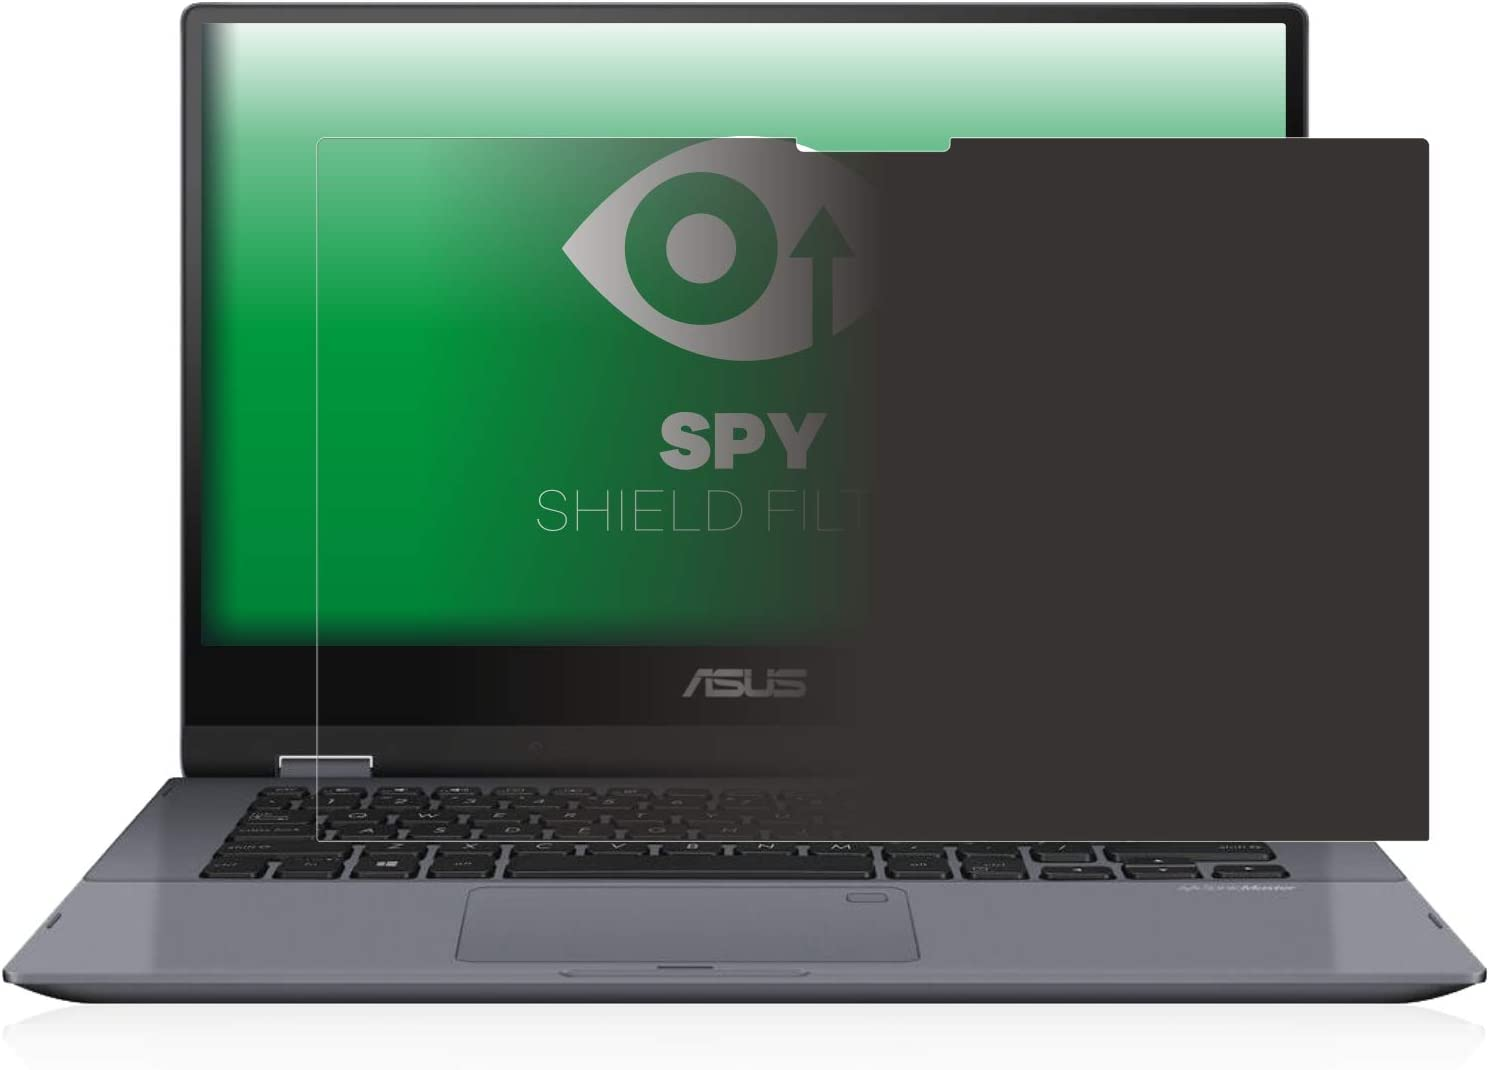 upscreen Blickschutzfilter kompatibel mit Dell XPS 9500 2020 Privacy Filter Anti-Spy Blickschutzfolie Sichtschutz-Folie